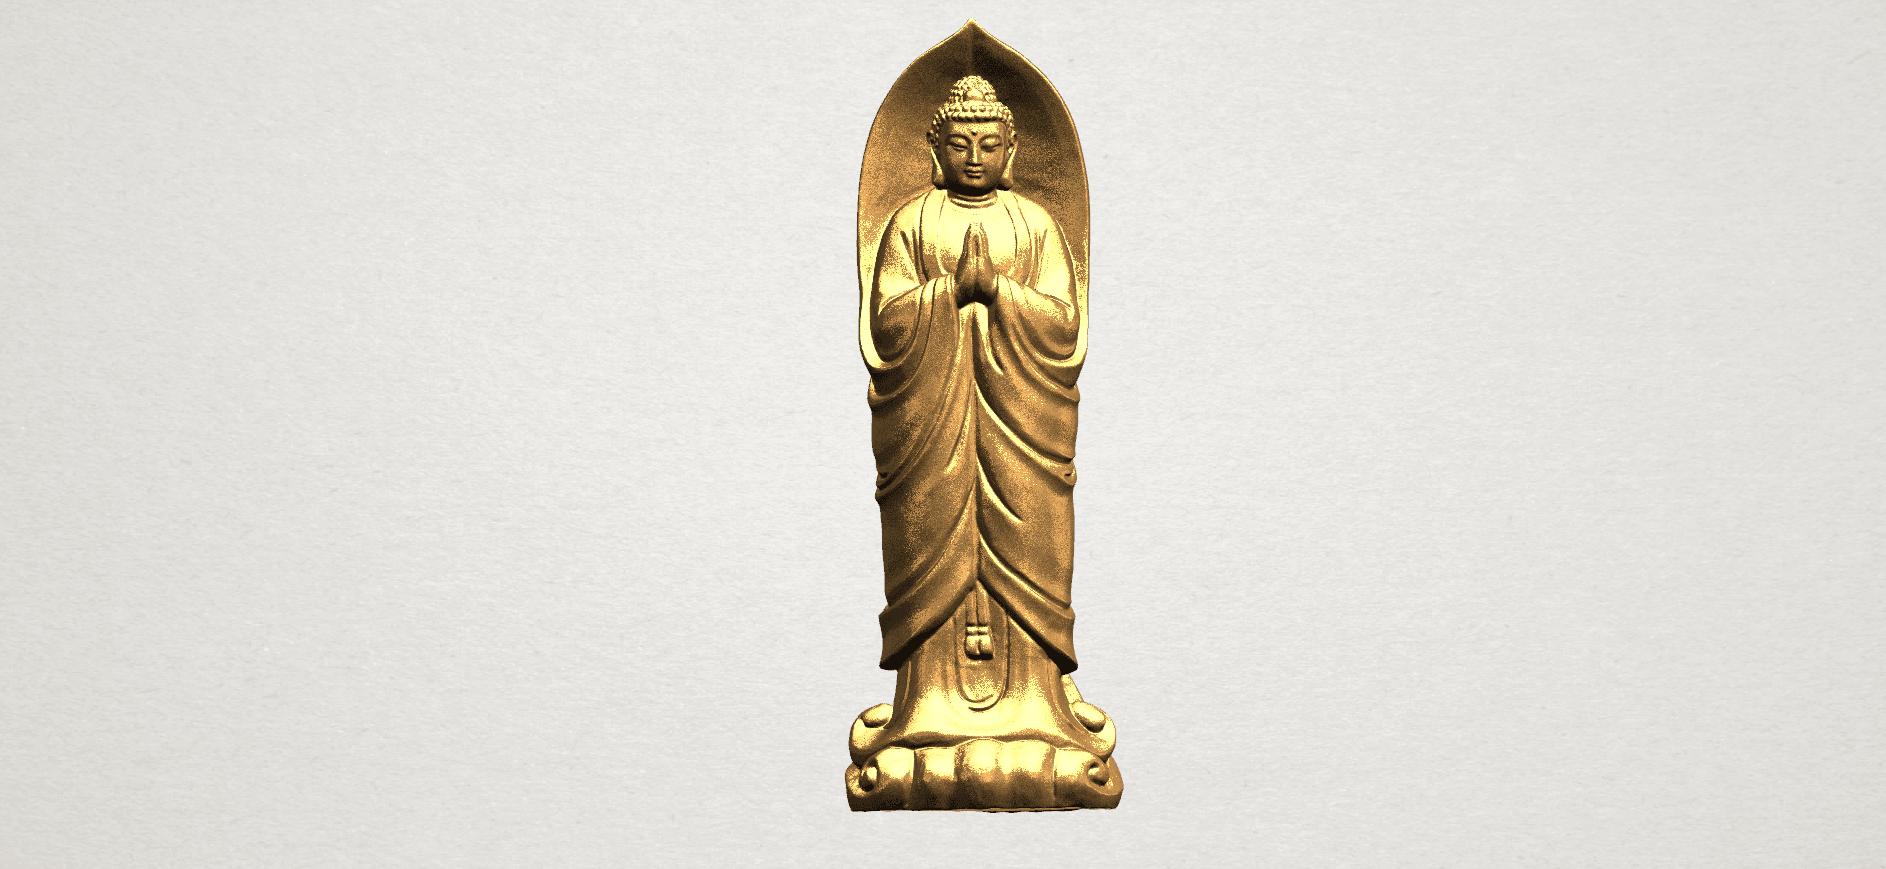 Gautama Buddha Standing (iv) A01.png Download free STL file Gautama Buddha Standing 04 • 3D printable design, GeorgesNikkei